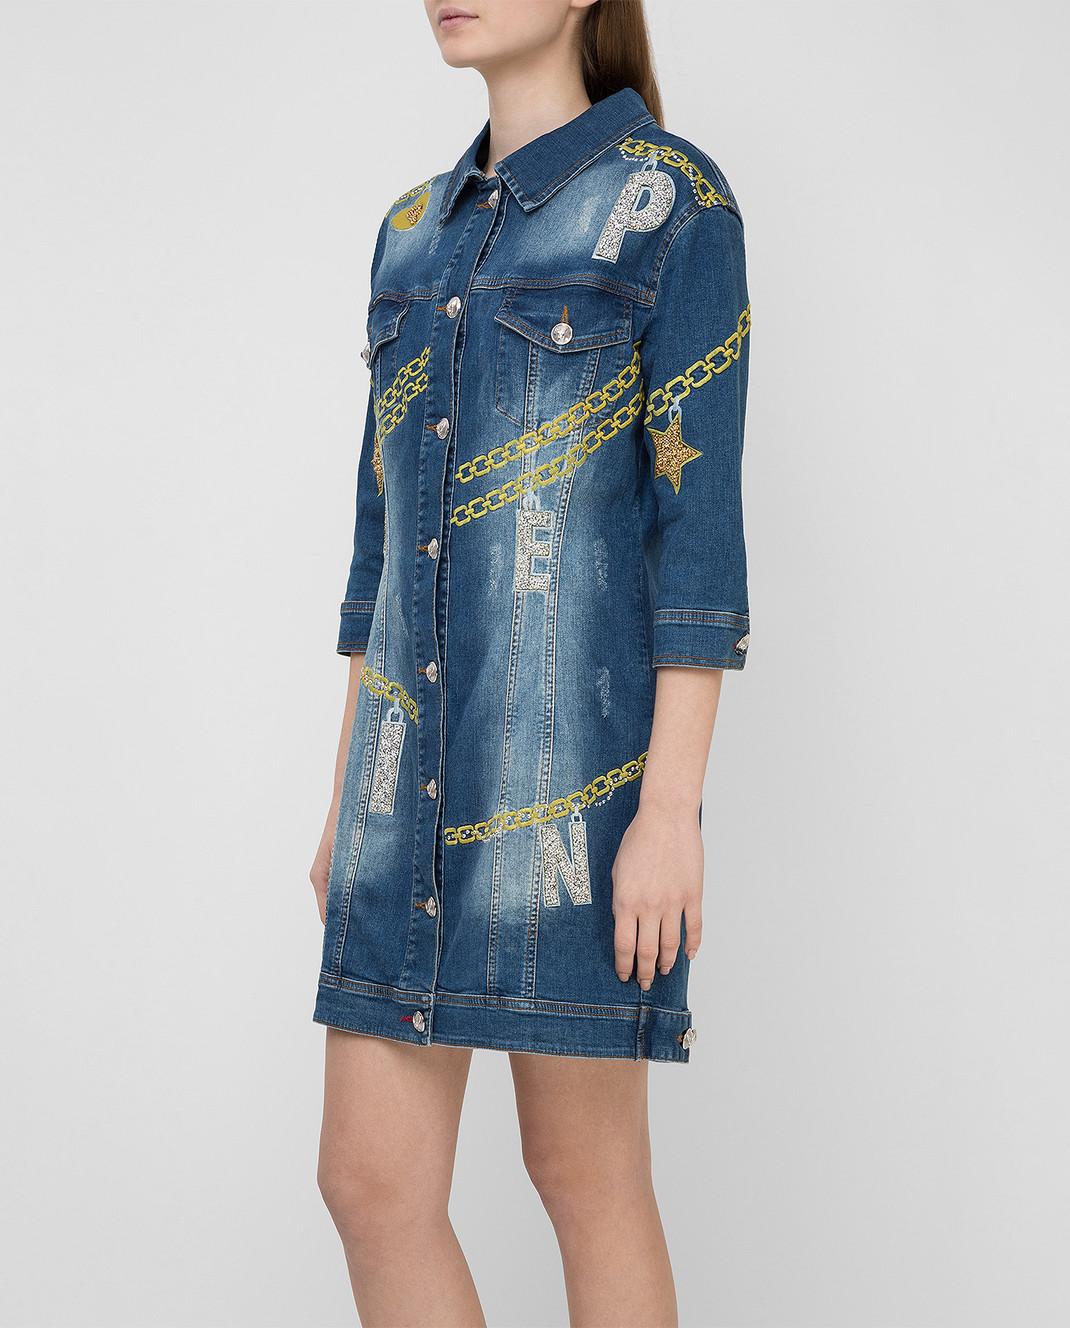 Philipp Plein Синее платье CWDG0016 изображение 3